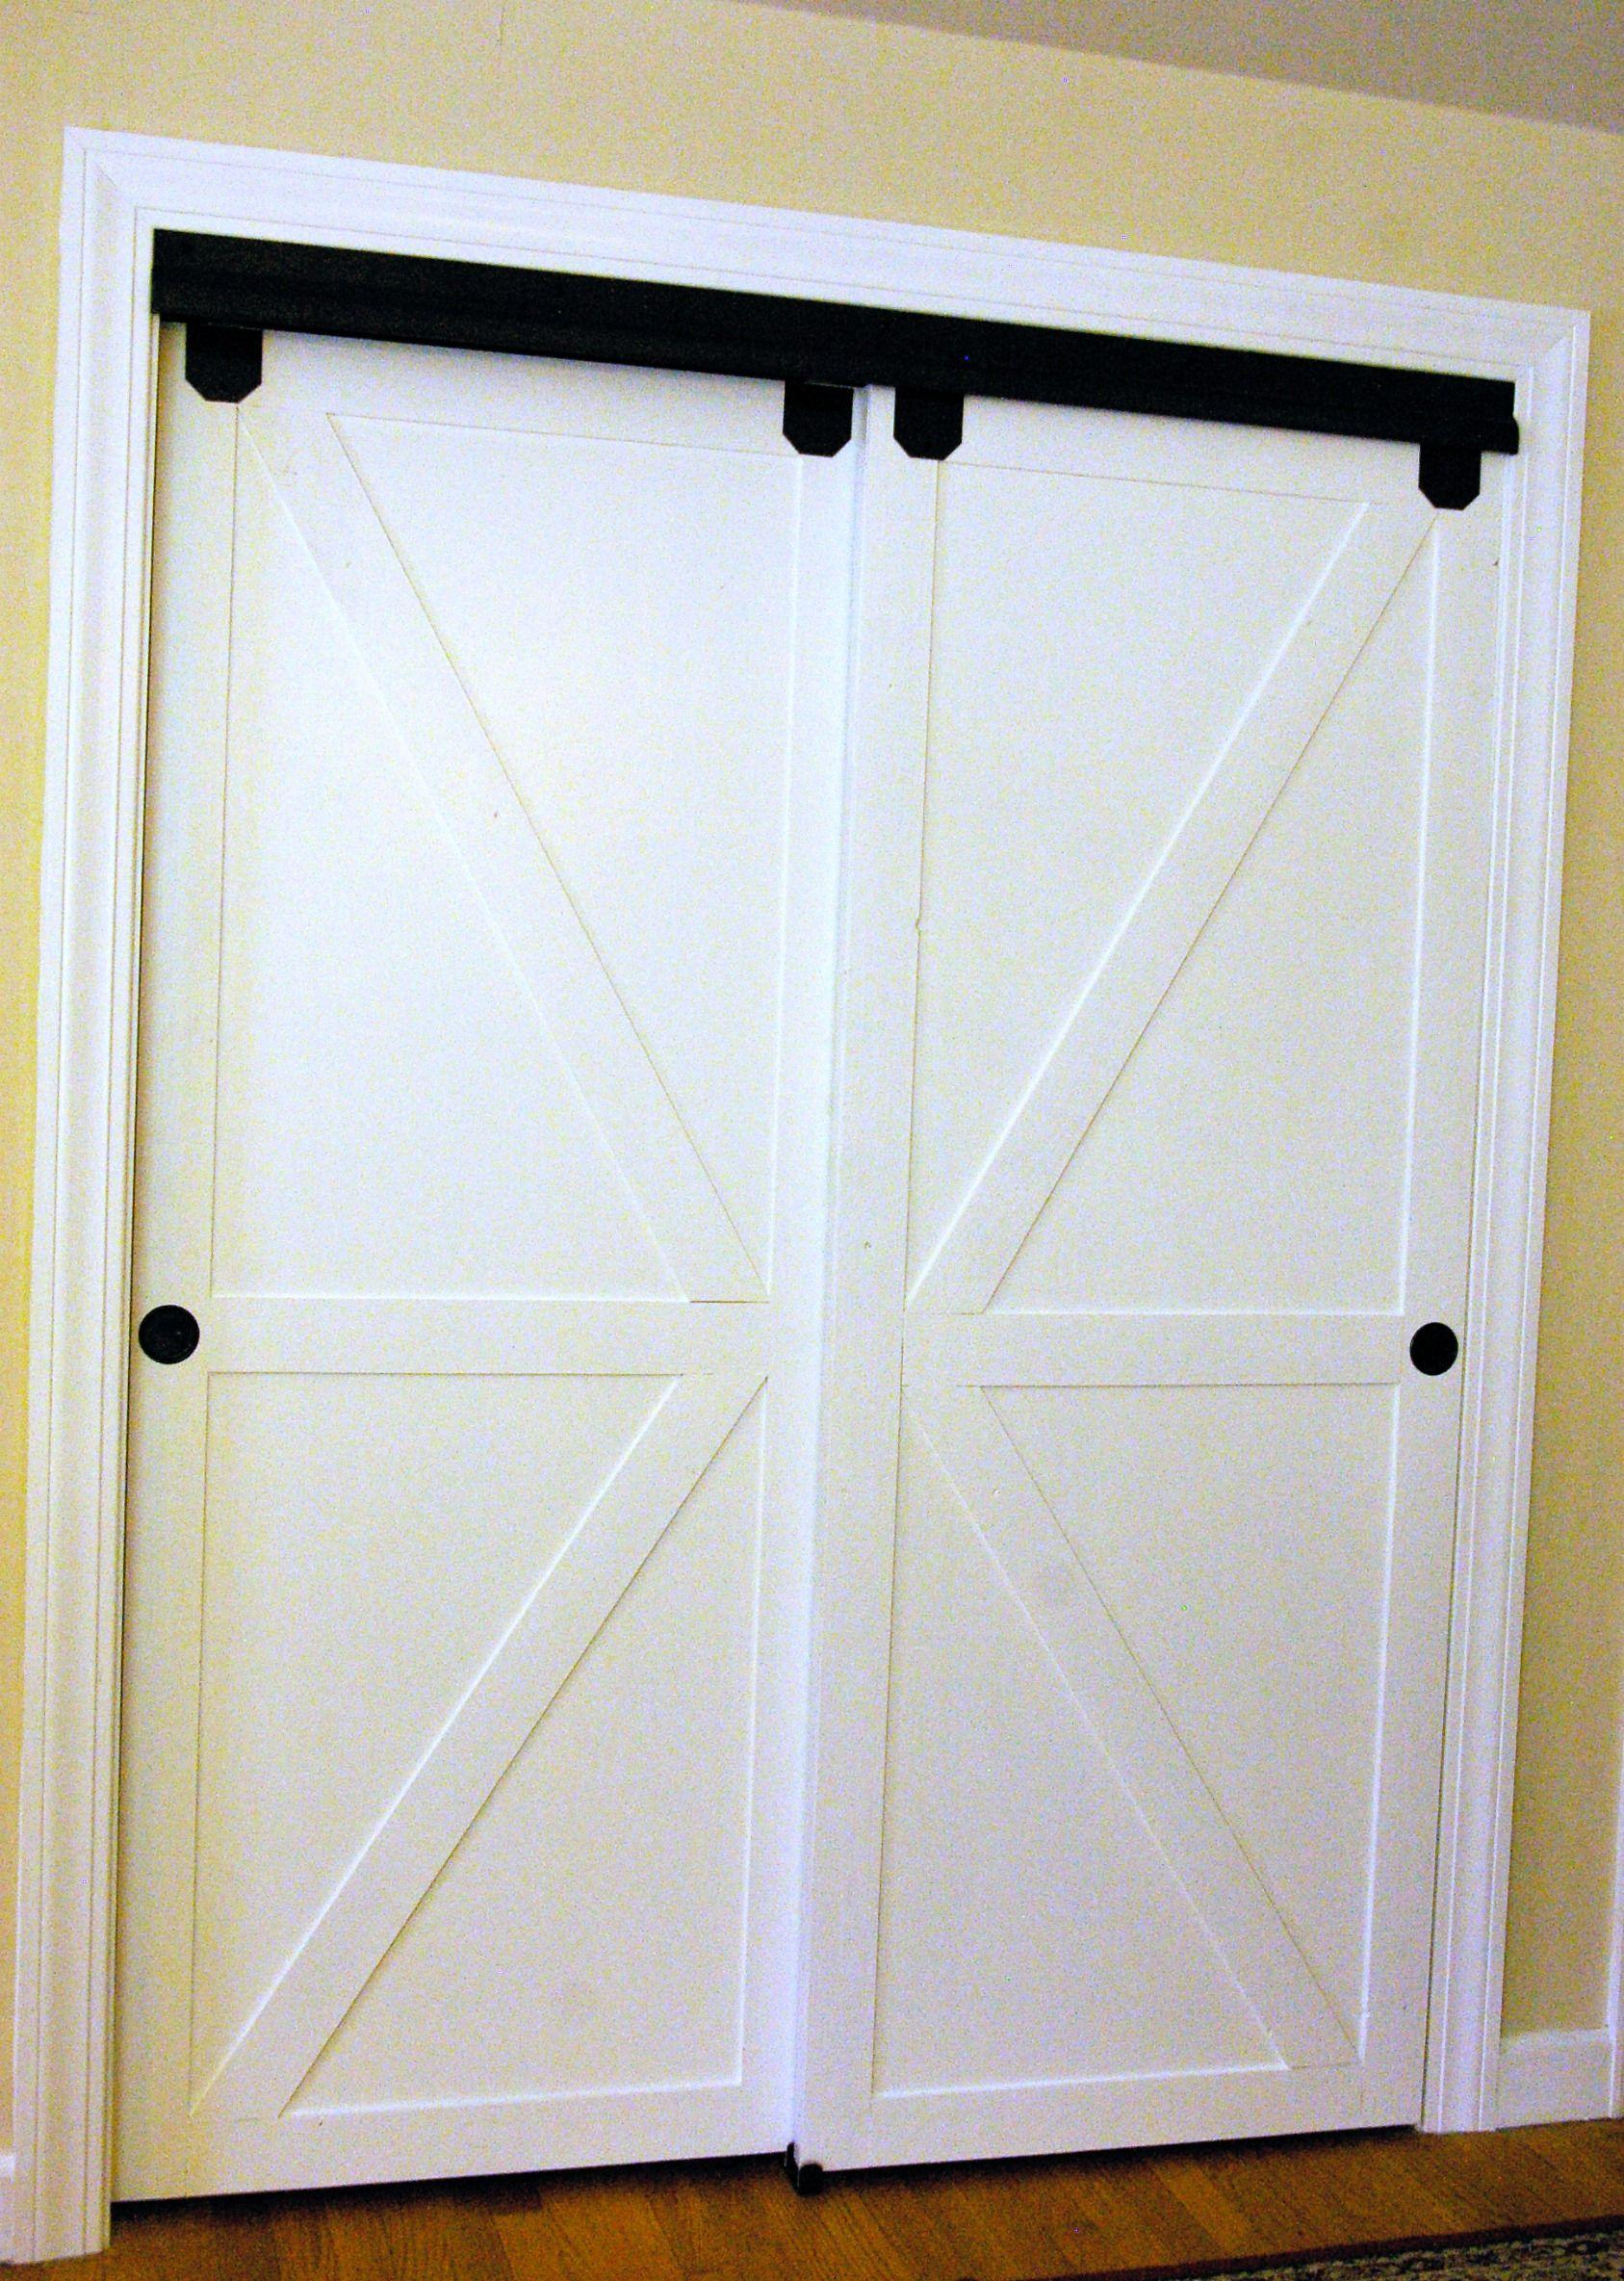 Diy Faux Barn Doors On A Sliding Bypass Closet Door 02 Featured On